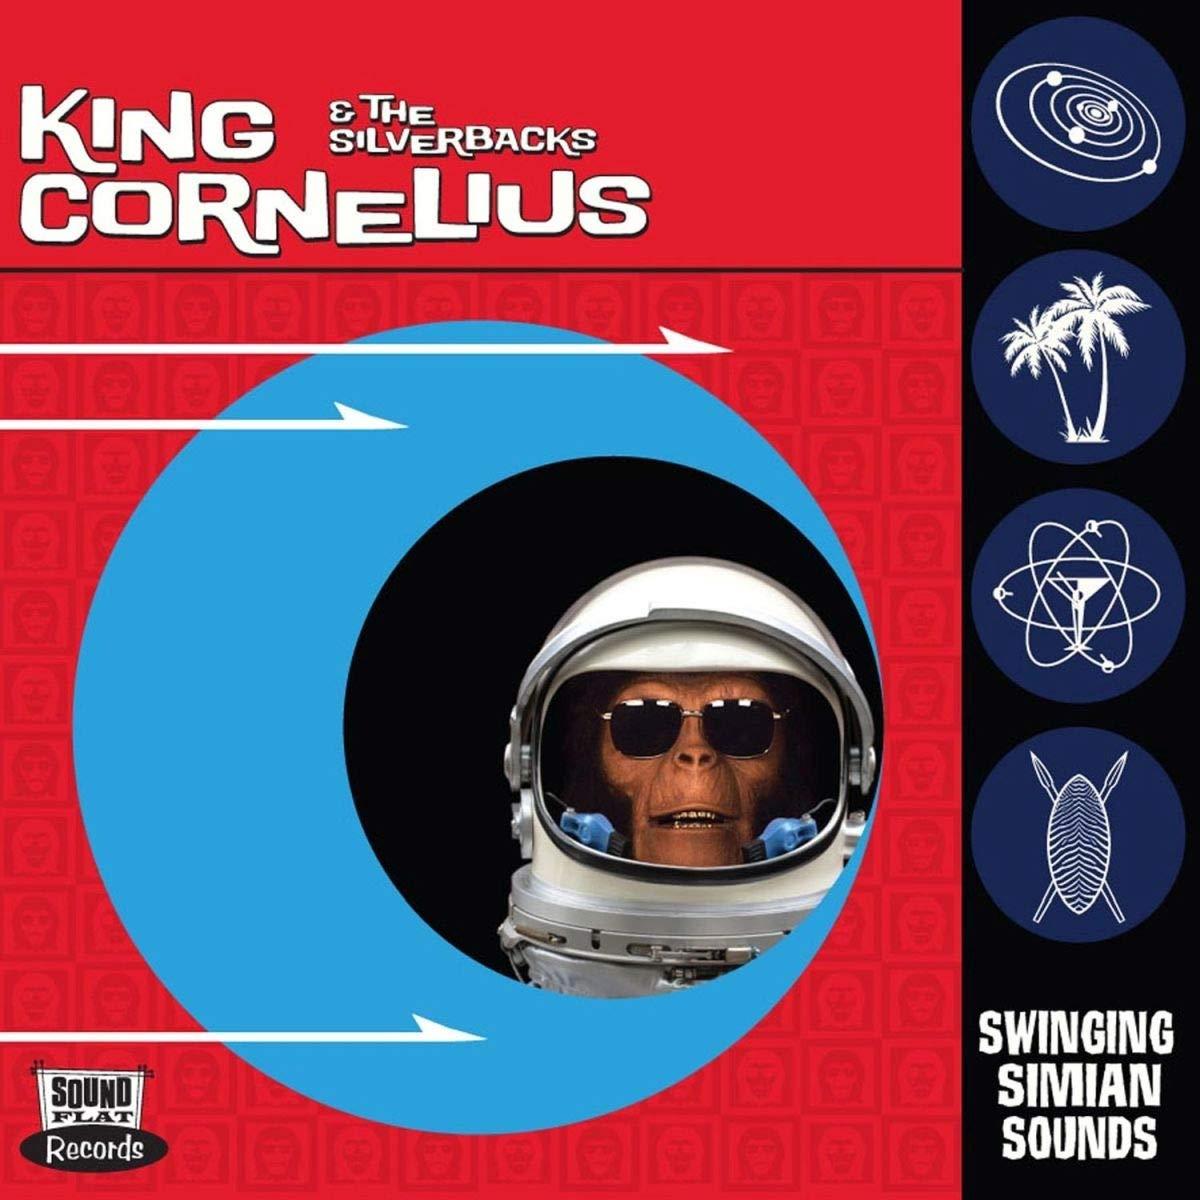 Vinilo : King Cornelius & Silverbacks - Swinging Simian Sounds (LP Vinyl)